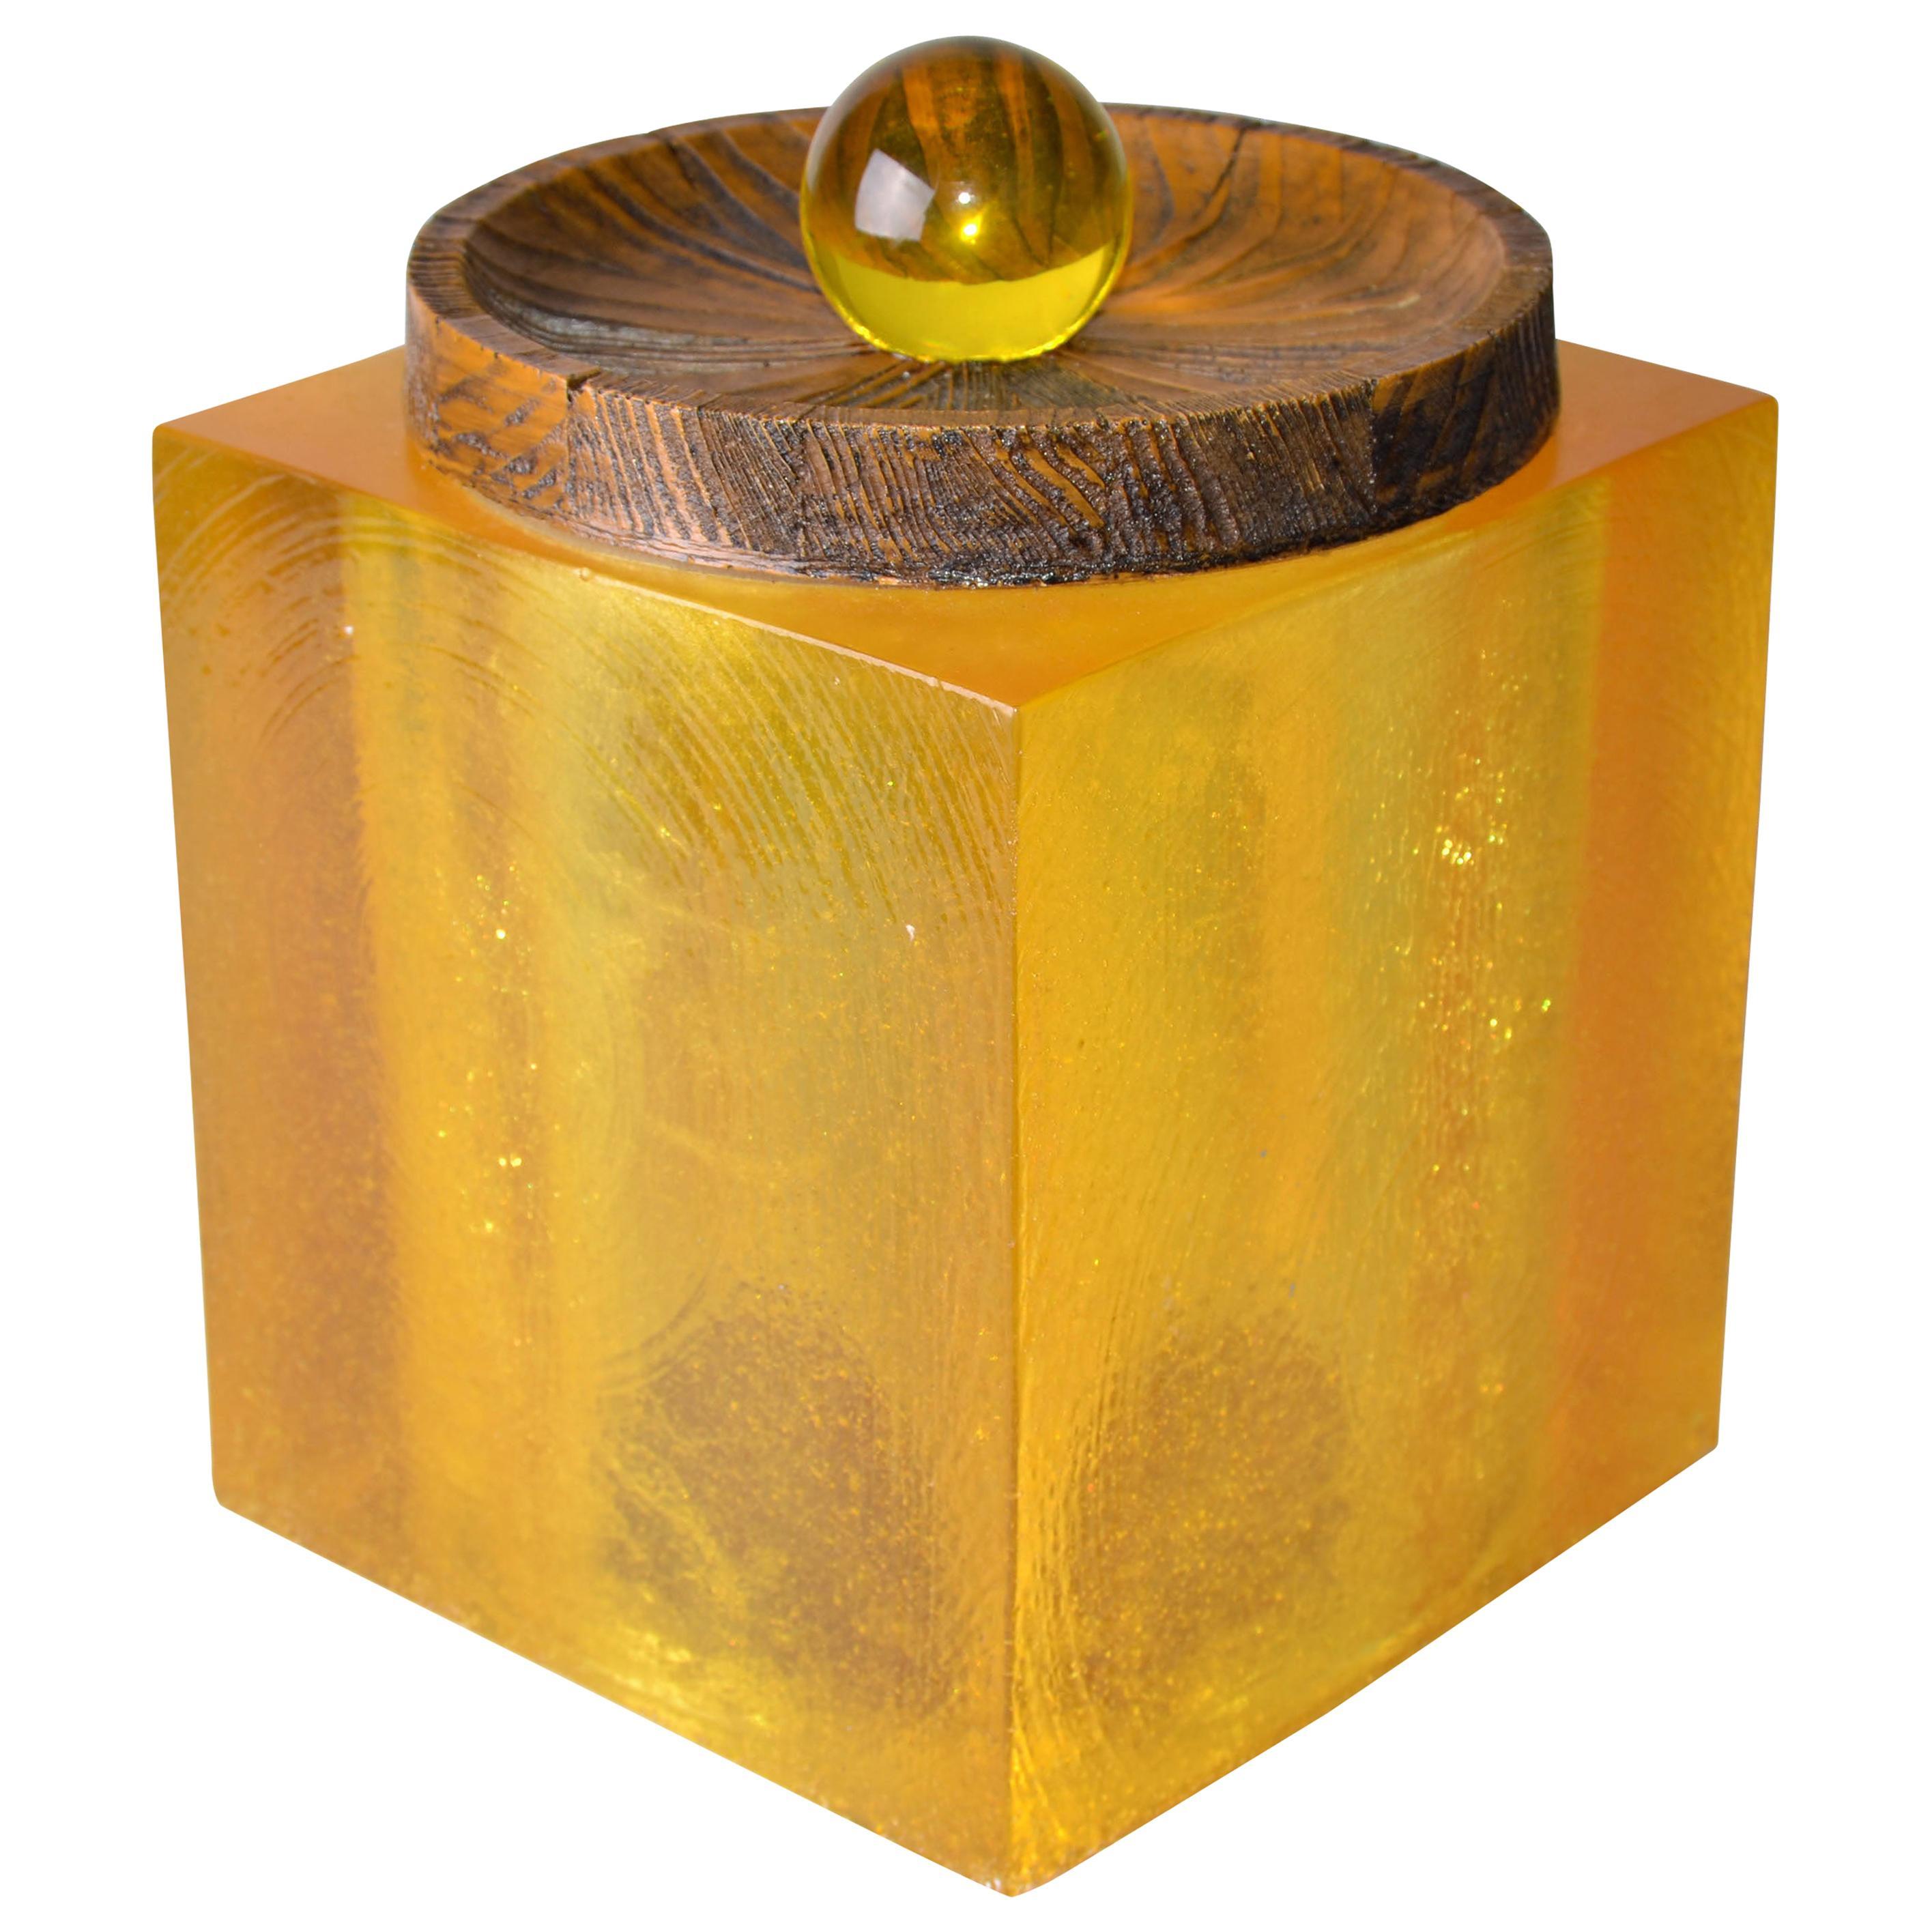 Mid-Century Modern Amber Color Acrylic Cork and Wood Ice Bucket